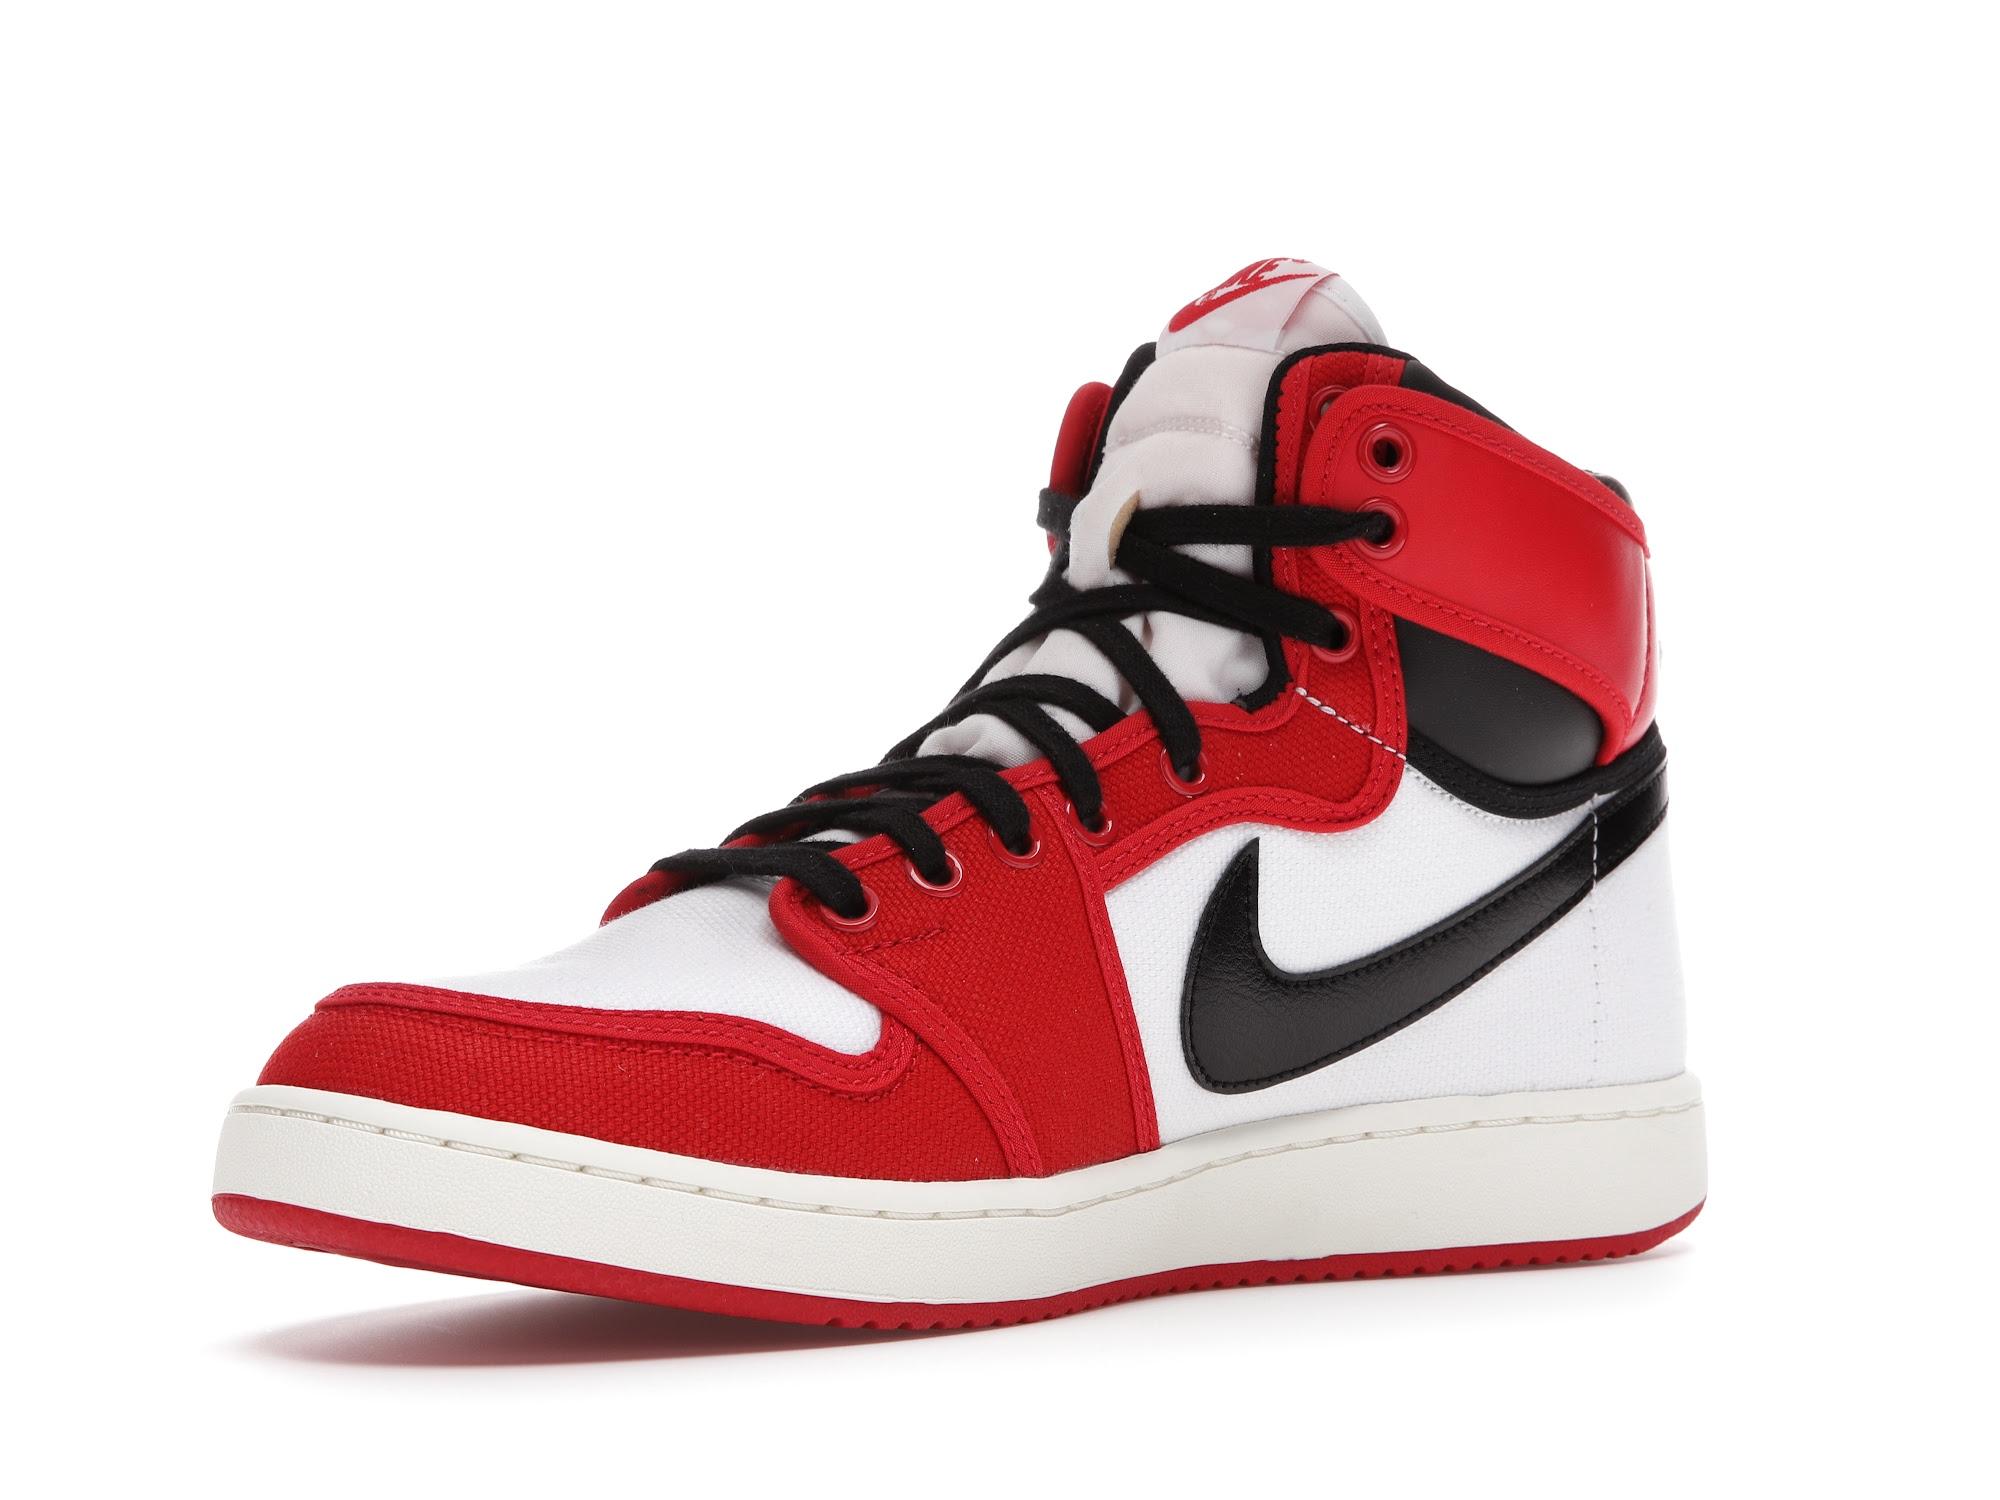 Jordan 1 Retro AJKO Chicago (2021) - DA9089-100